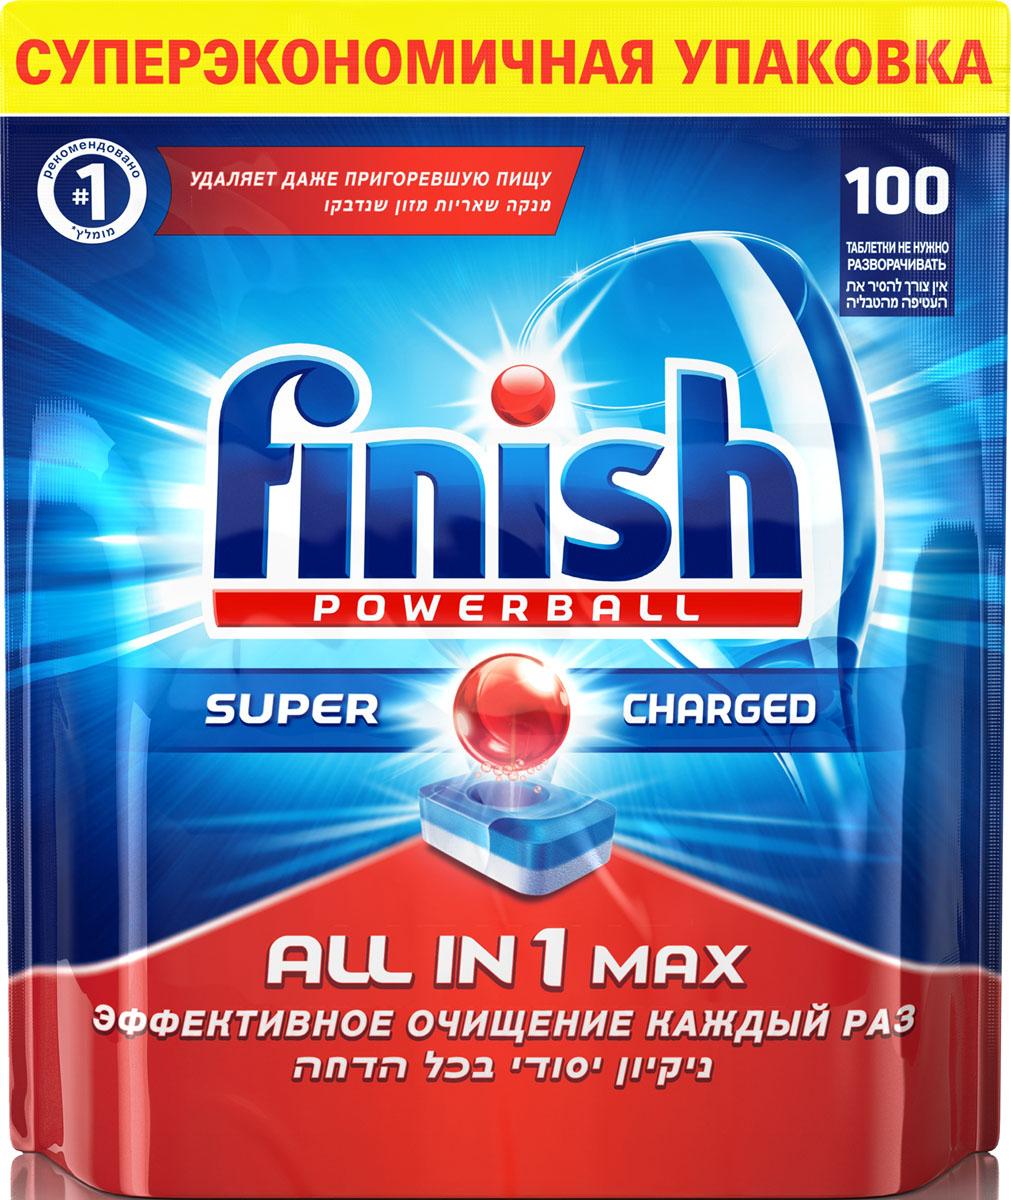 Таблетки для посудомоечной машины Finish Powerball All in 1 Max, 100 шт ea7 902000 6p735